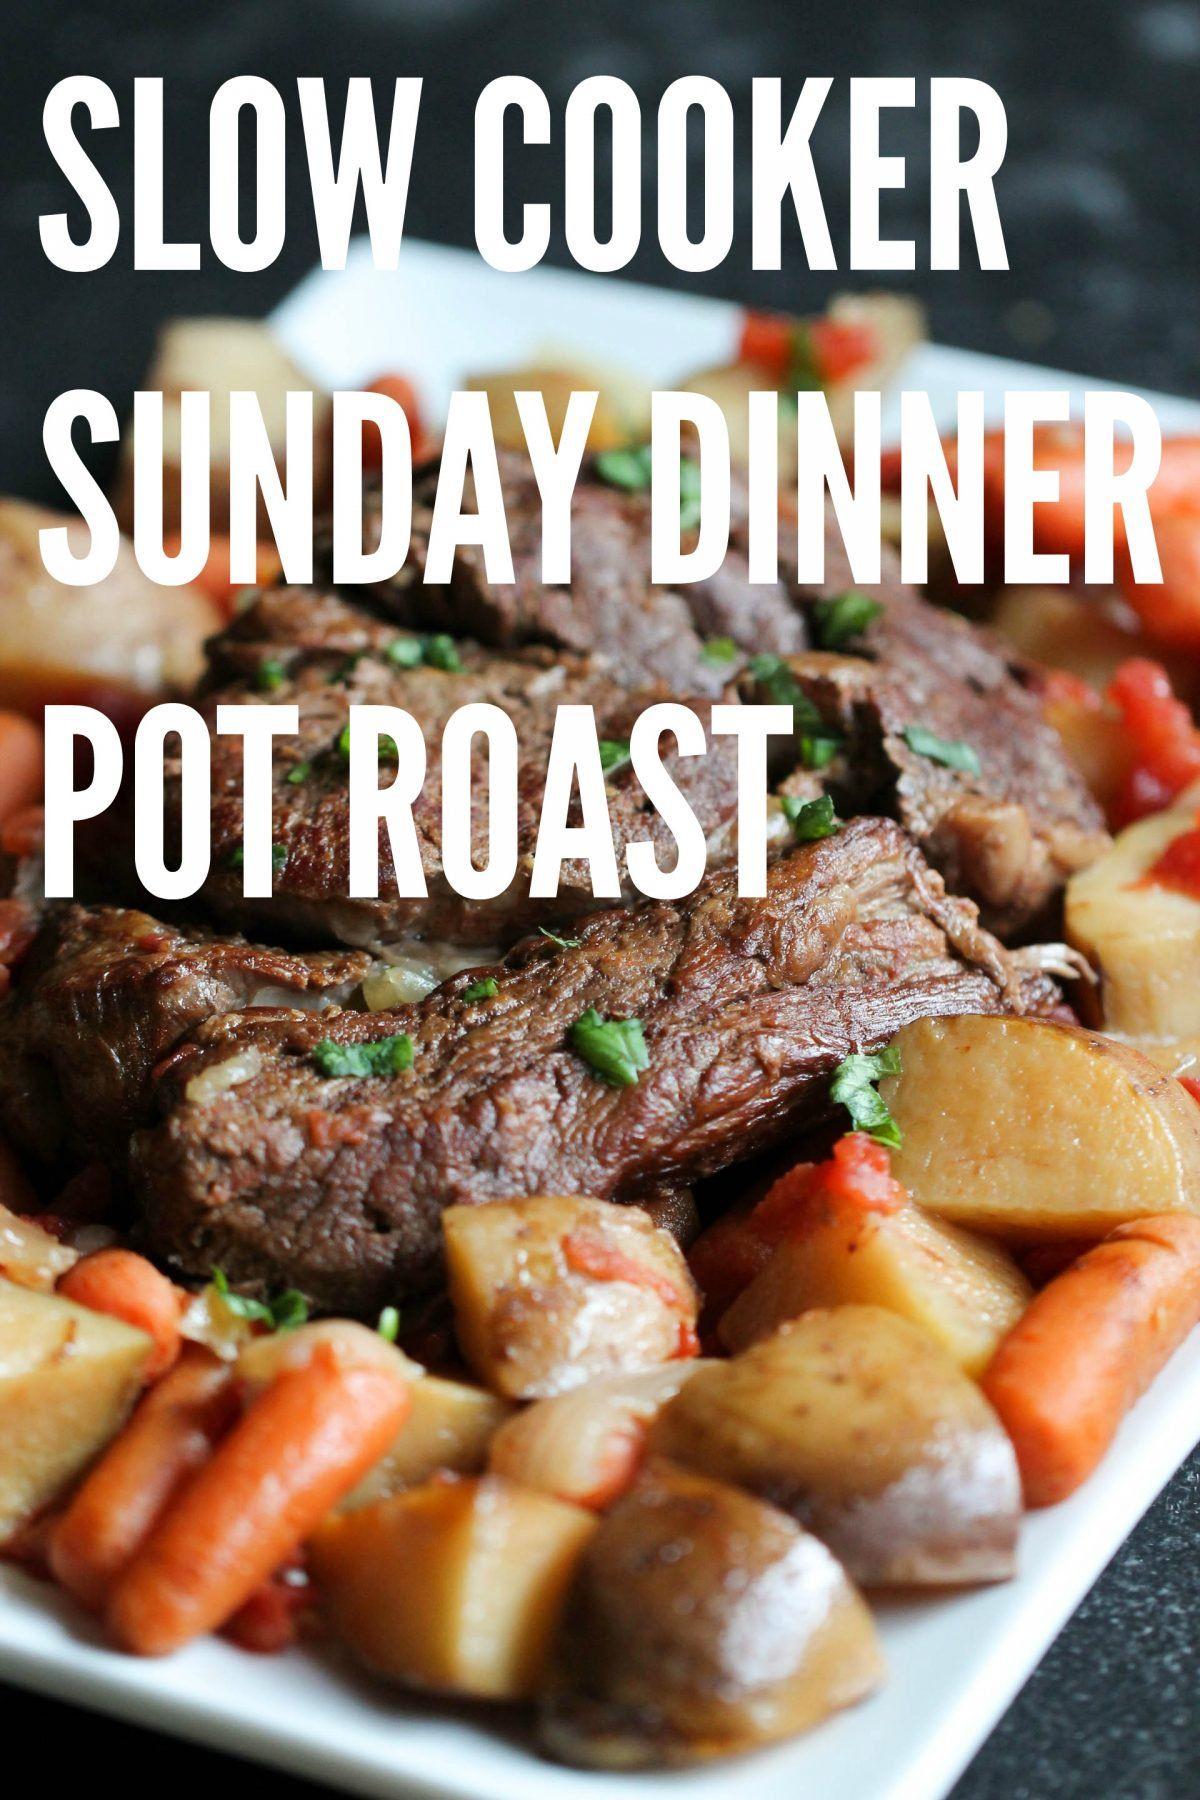 Slow Cooker Sunday Dinner Pot Roast and Gravy